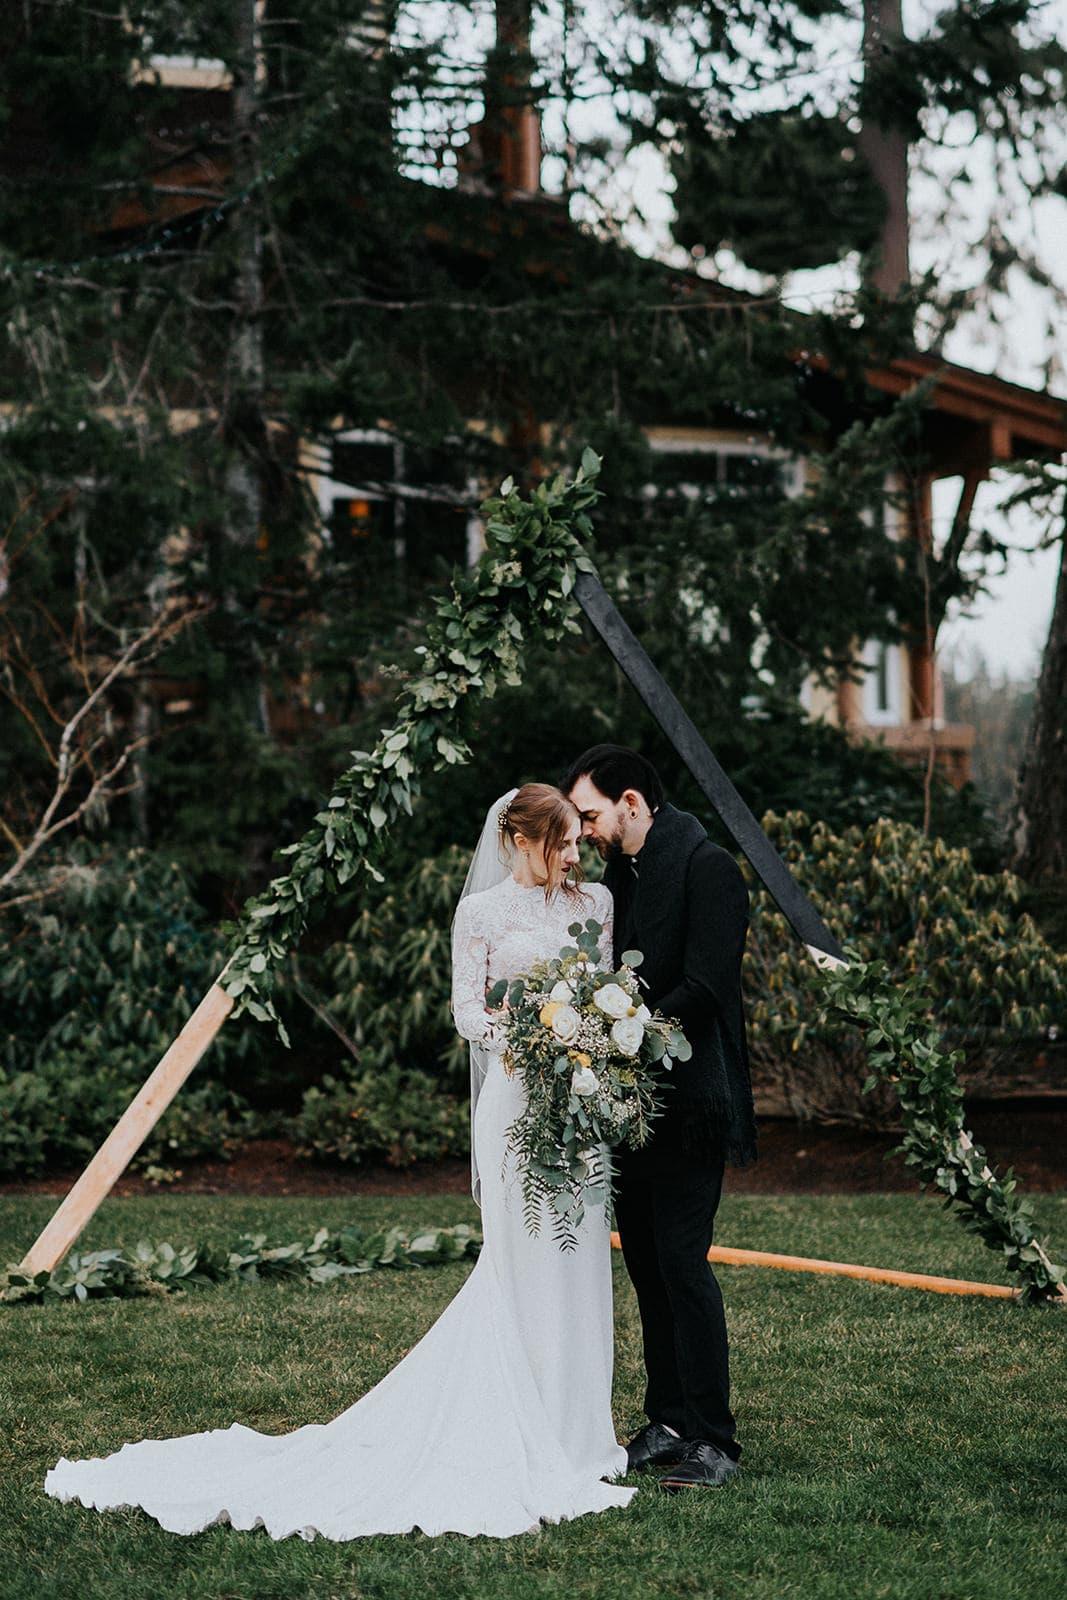 bride and groom weddings photos at Alderbrook resort